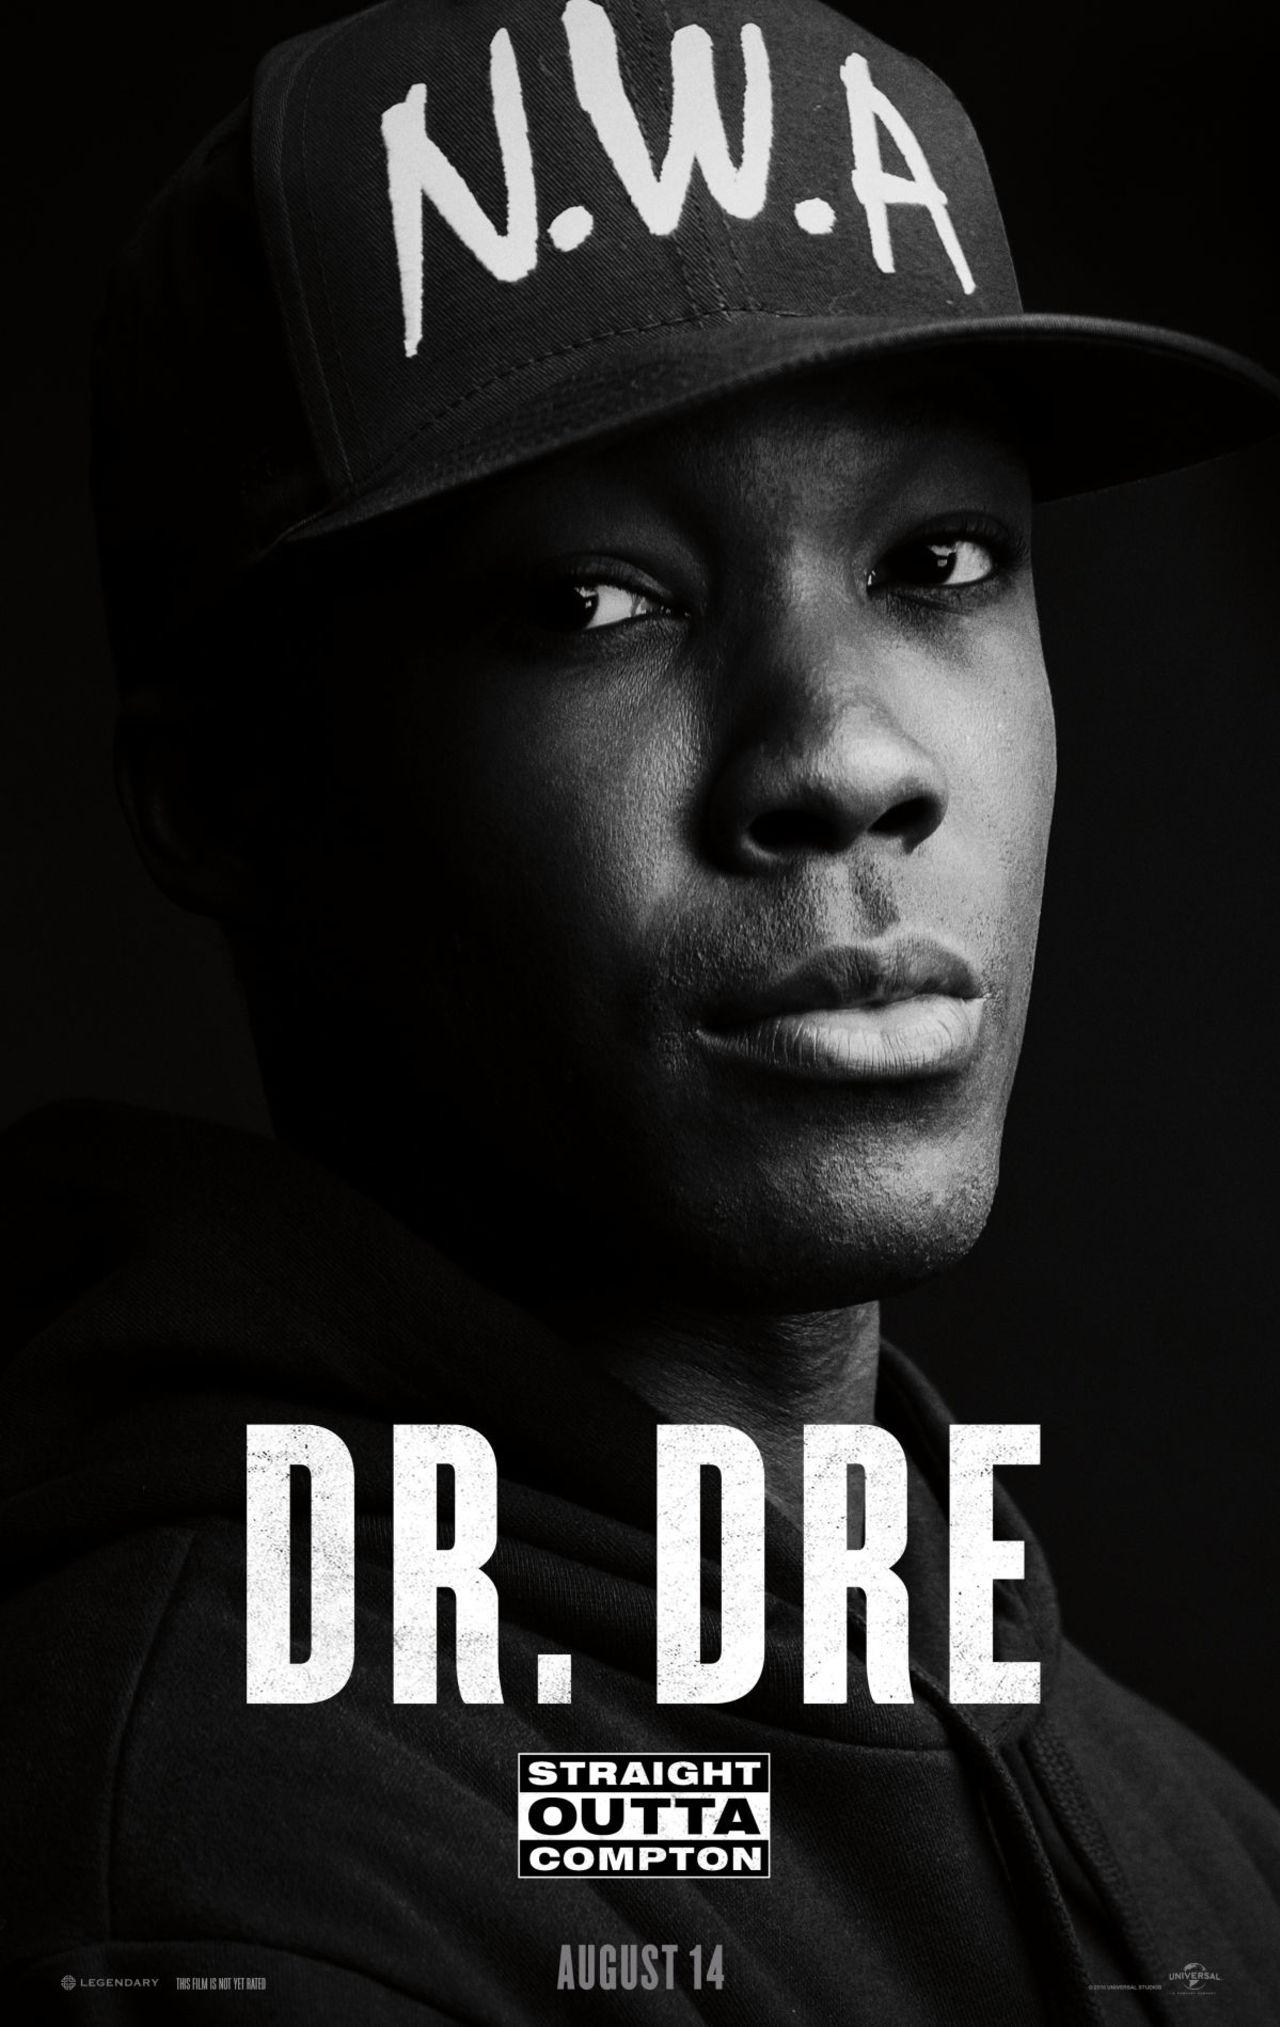 Corey Hawkins as Dr. Dre